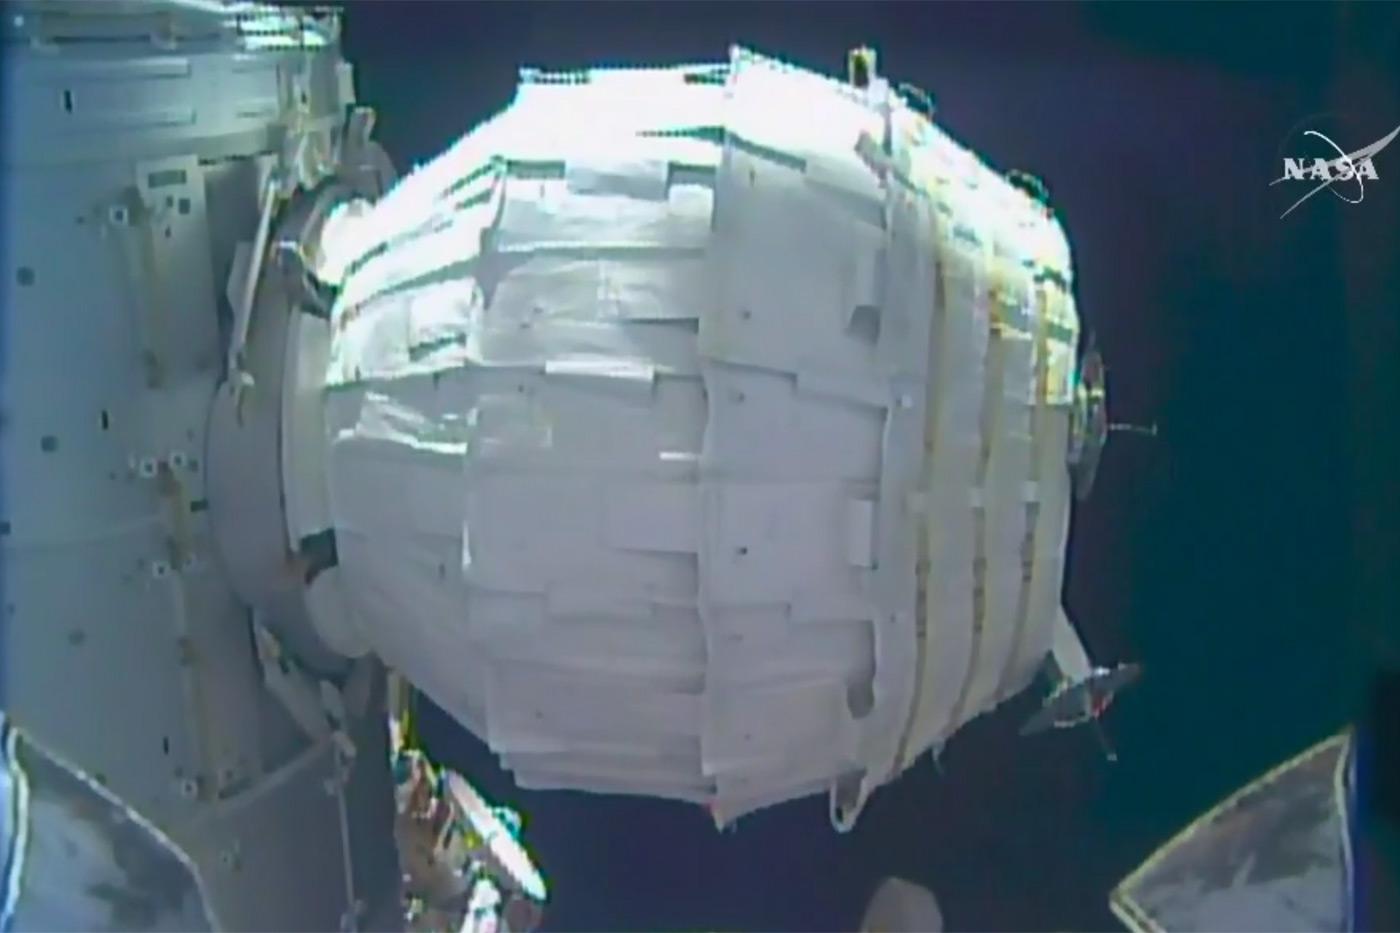 astronaut space habitat - photo #10